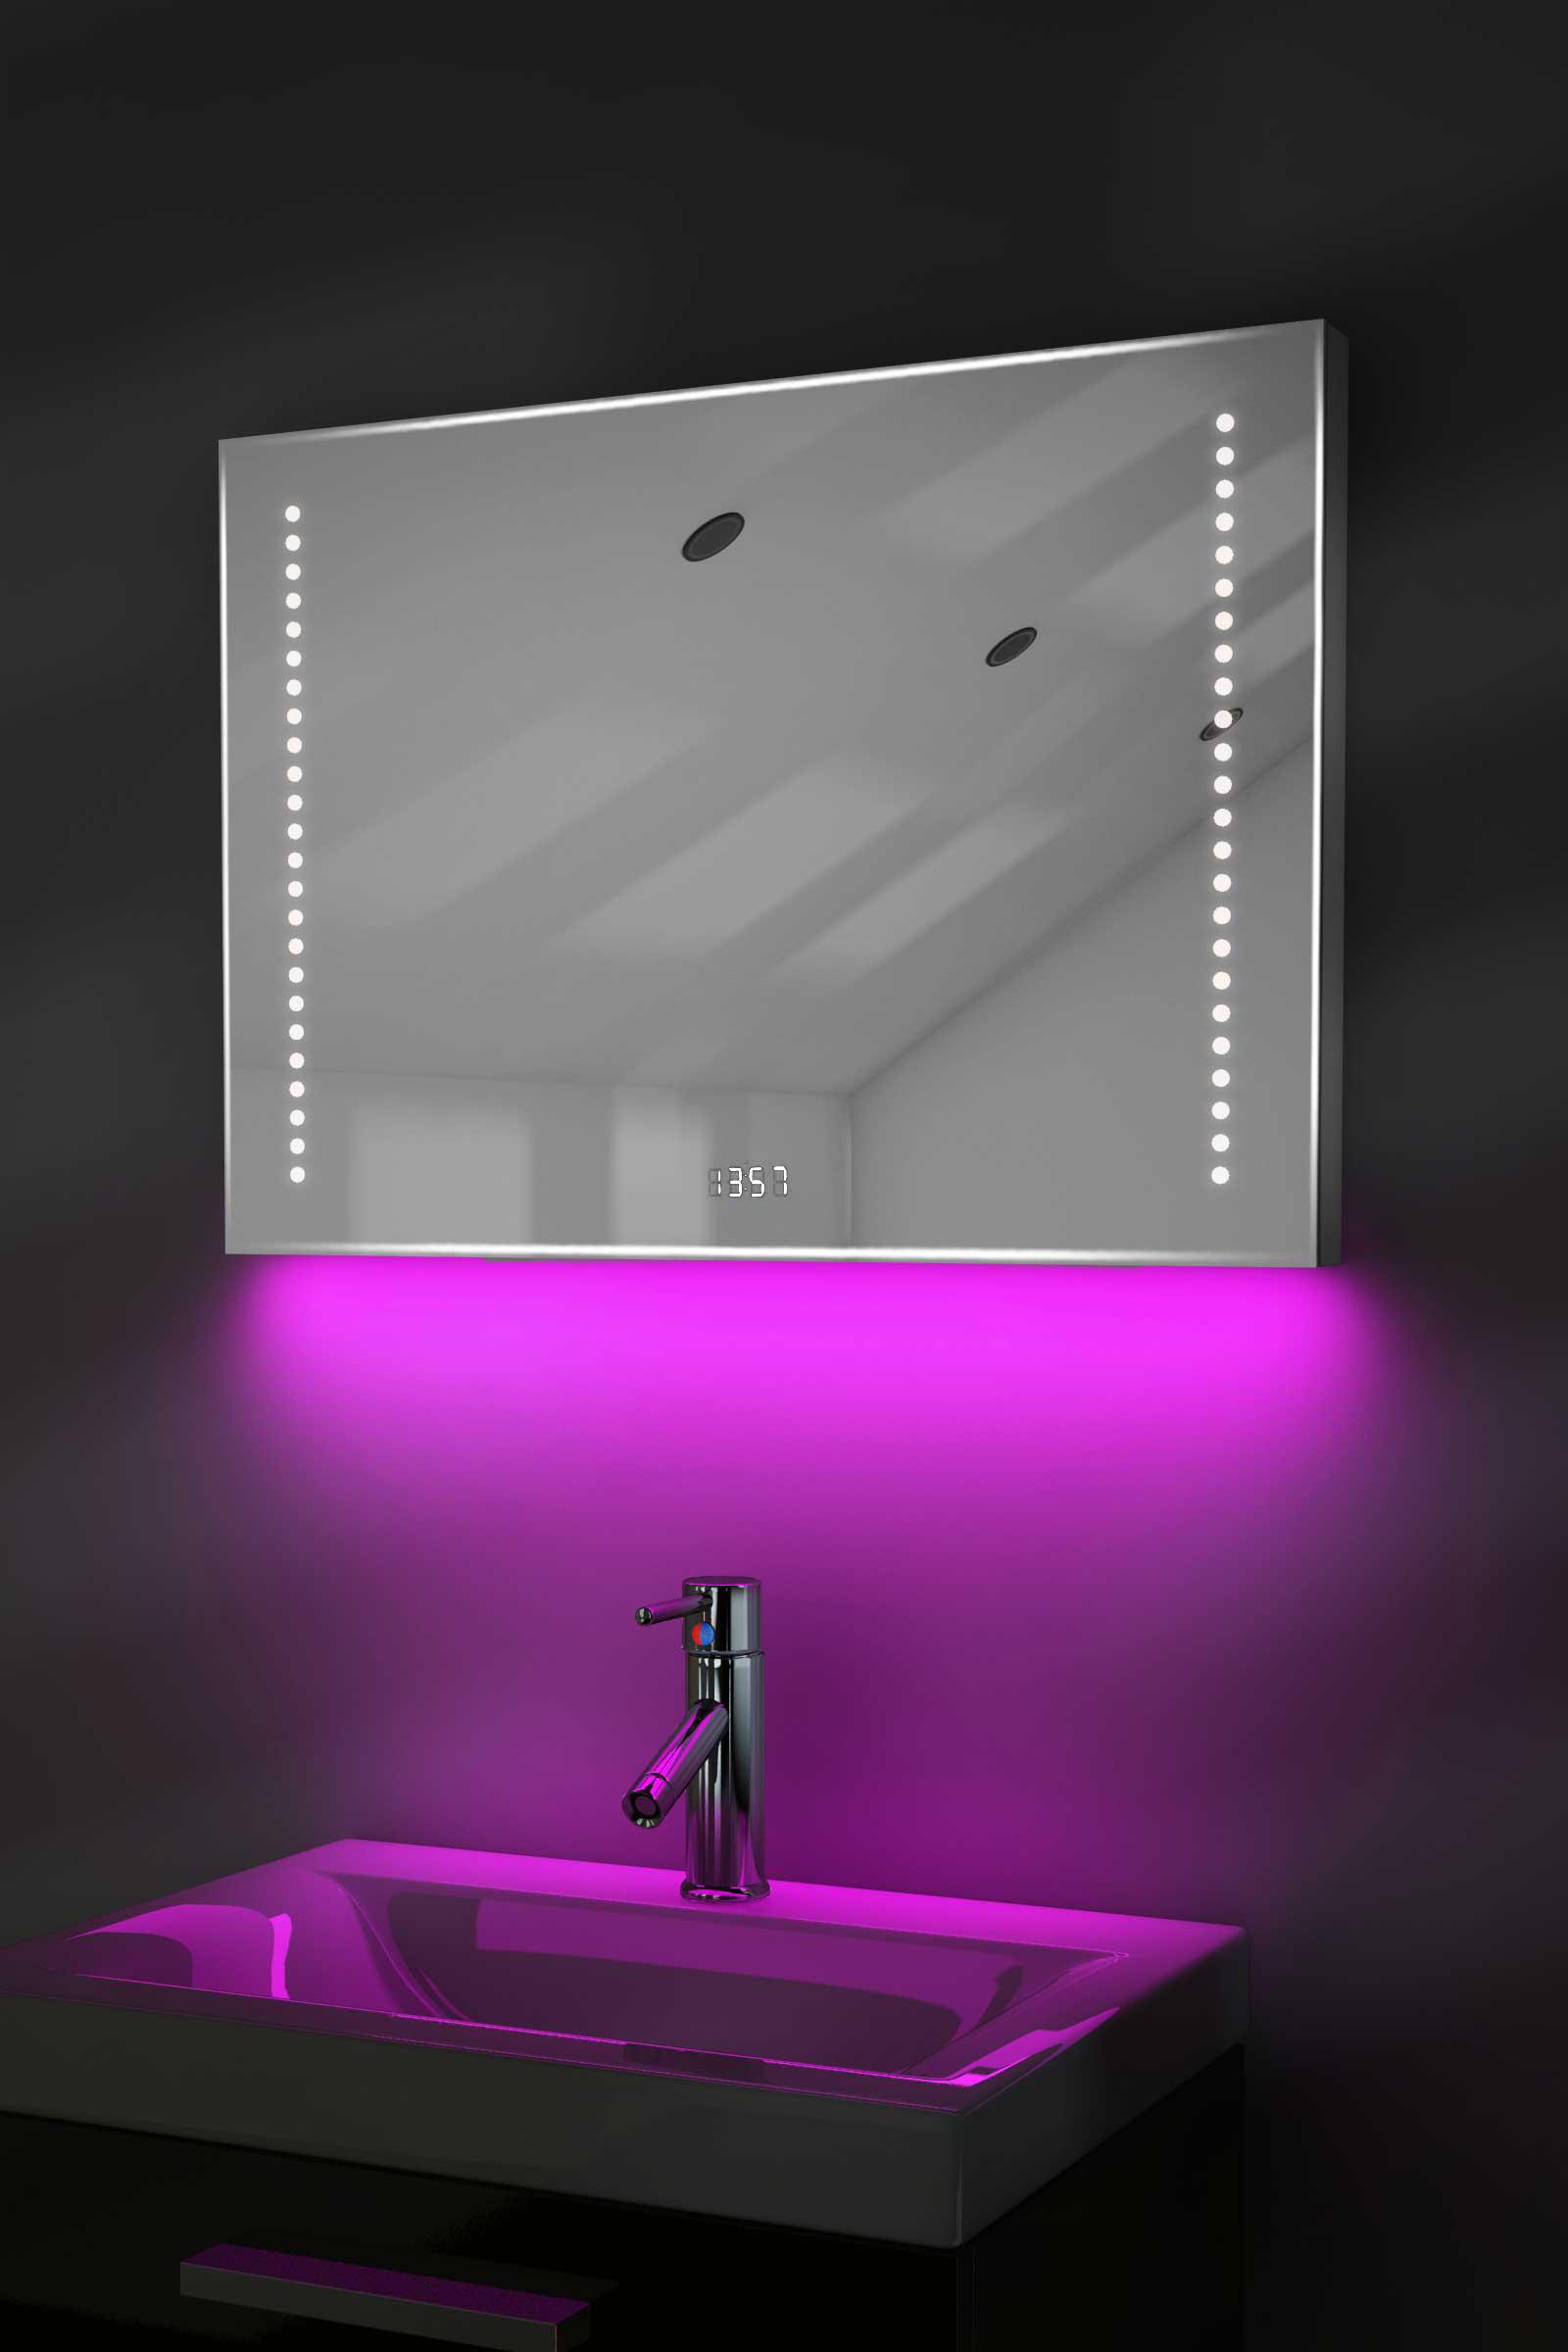 Digital Clock Shaver Bathroom Mirror With Under Lighting Demist Sensor K193p Ebay